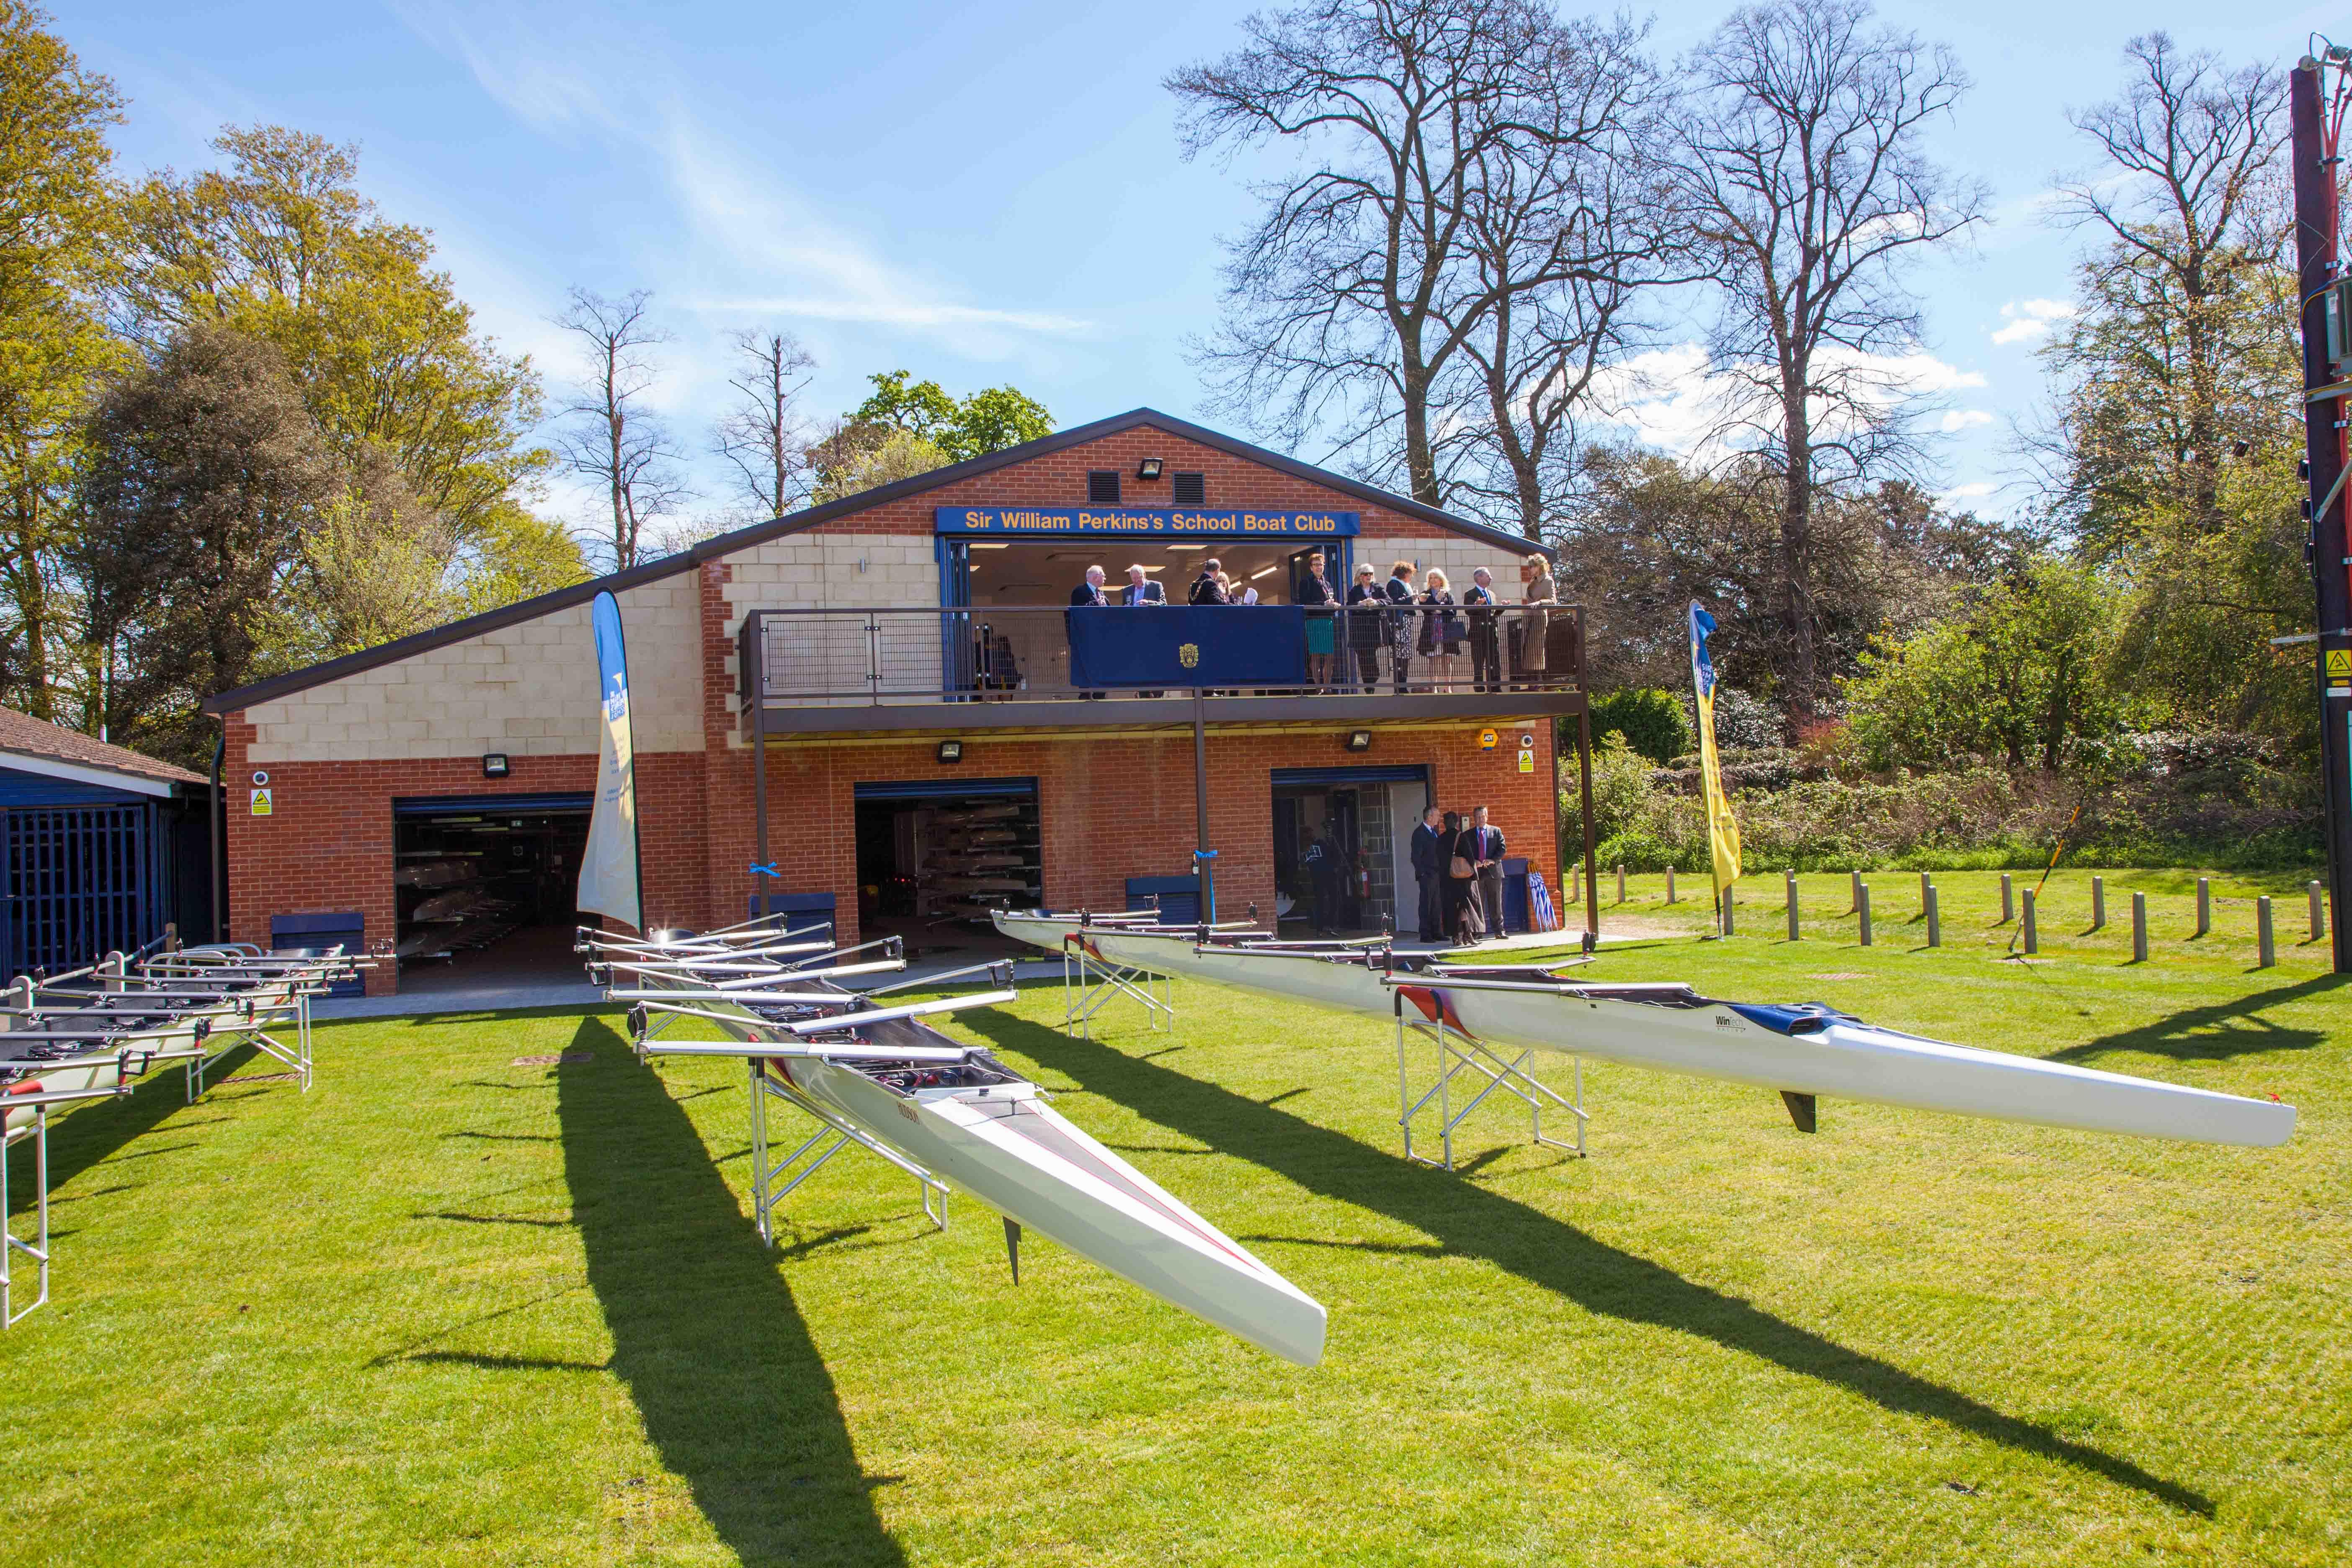 Boatperson & Rowing Coach at Sir William Perkins's School